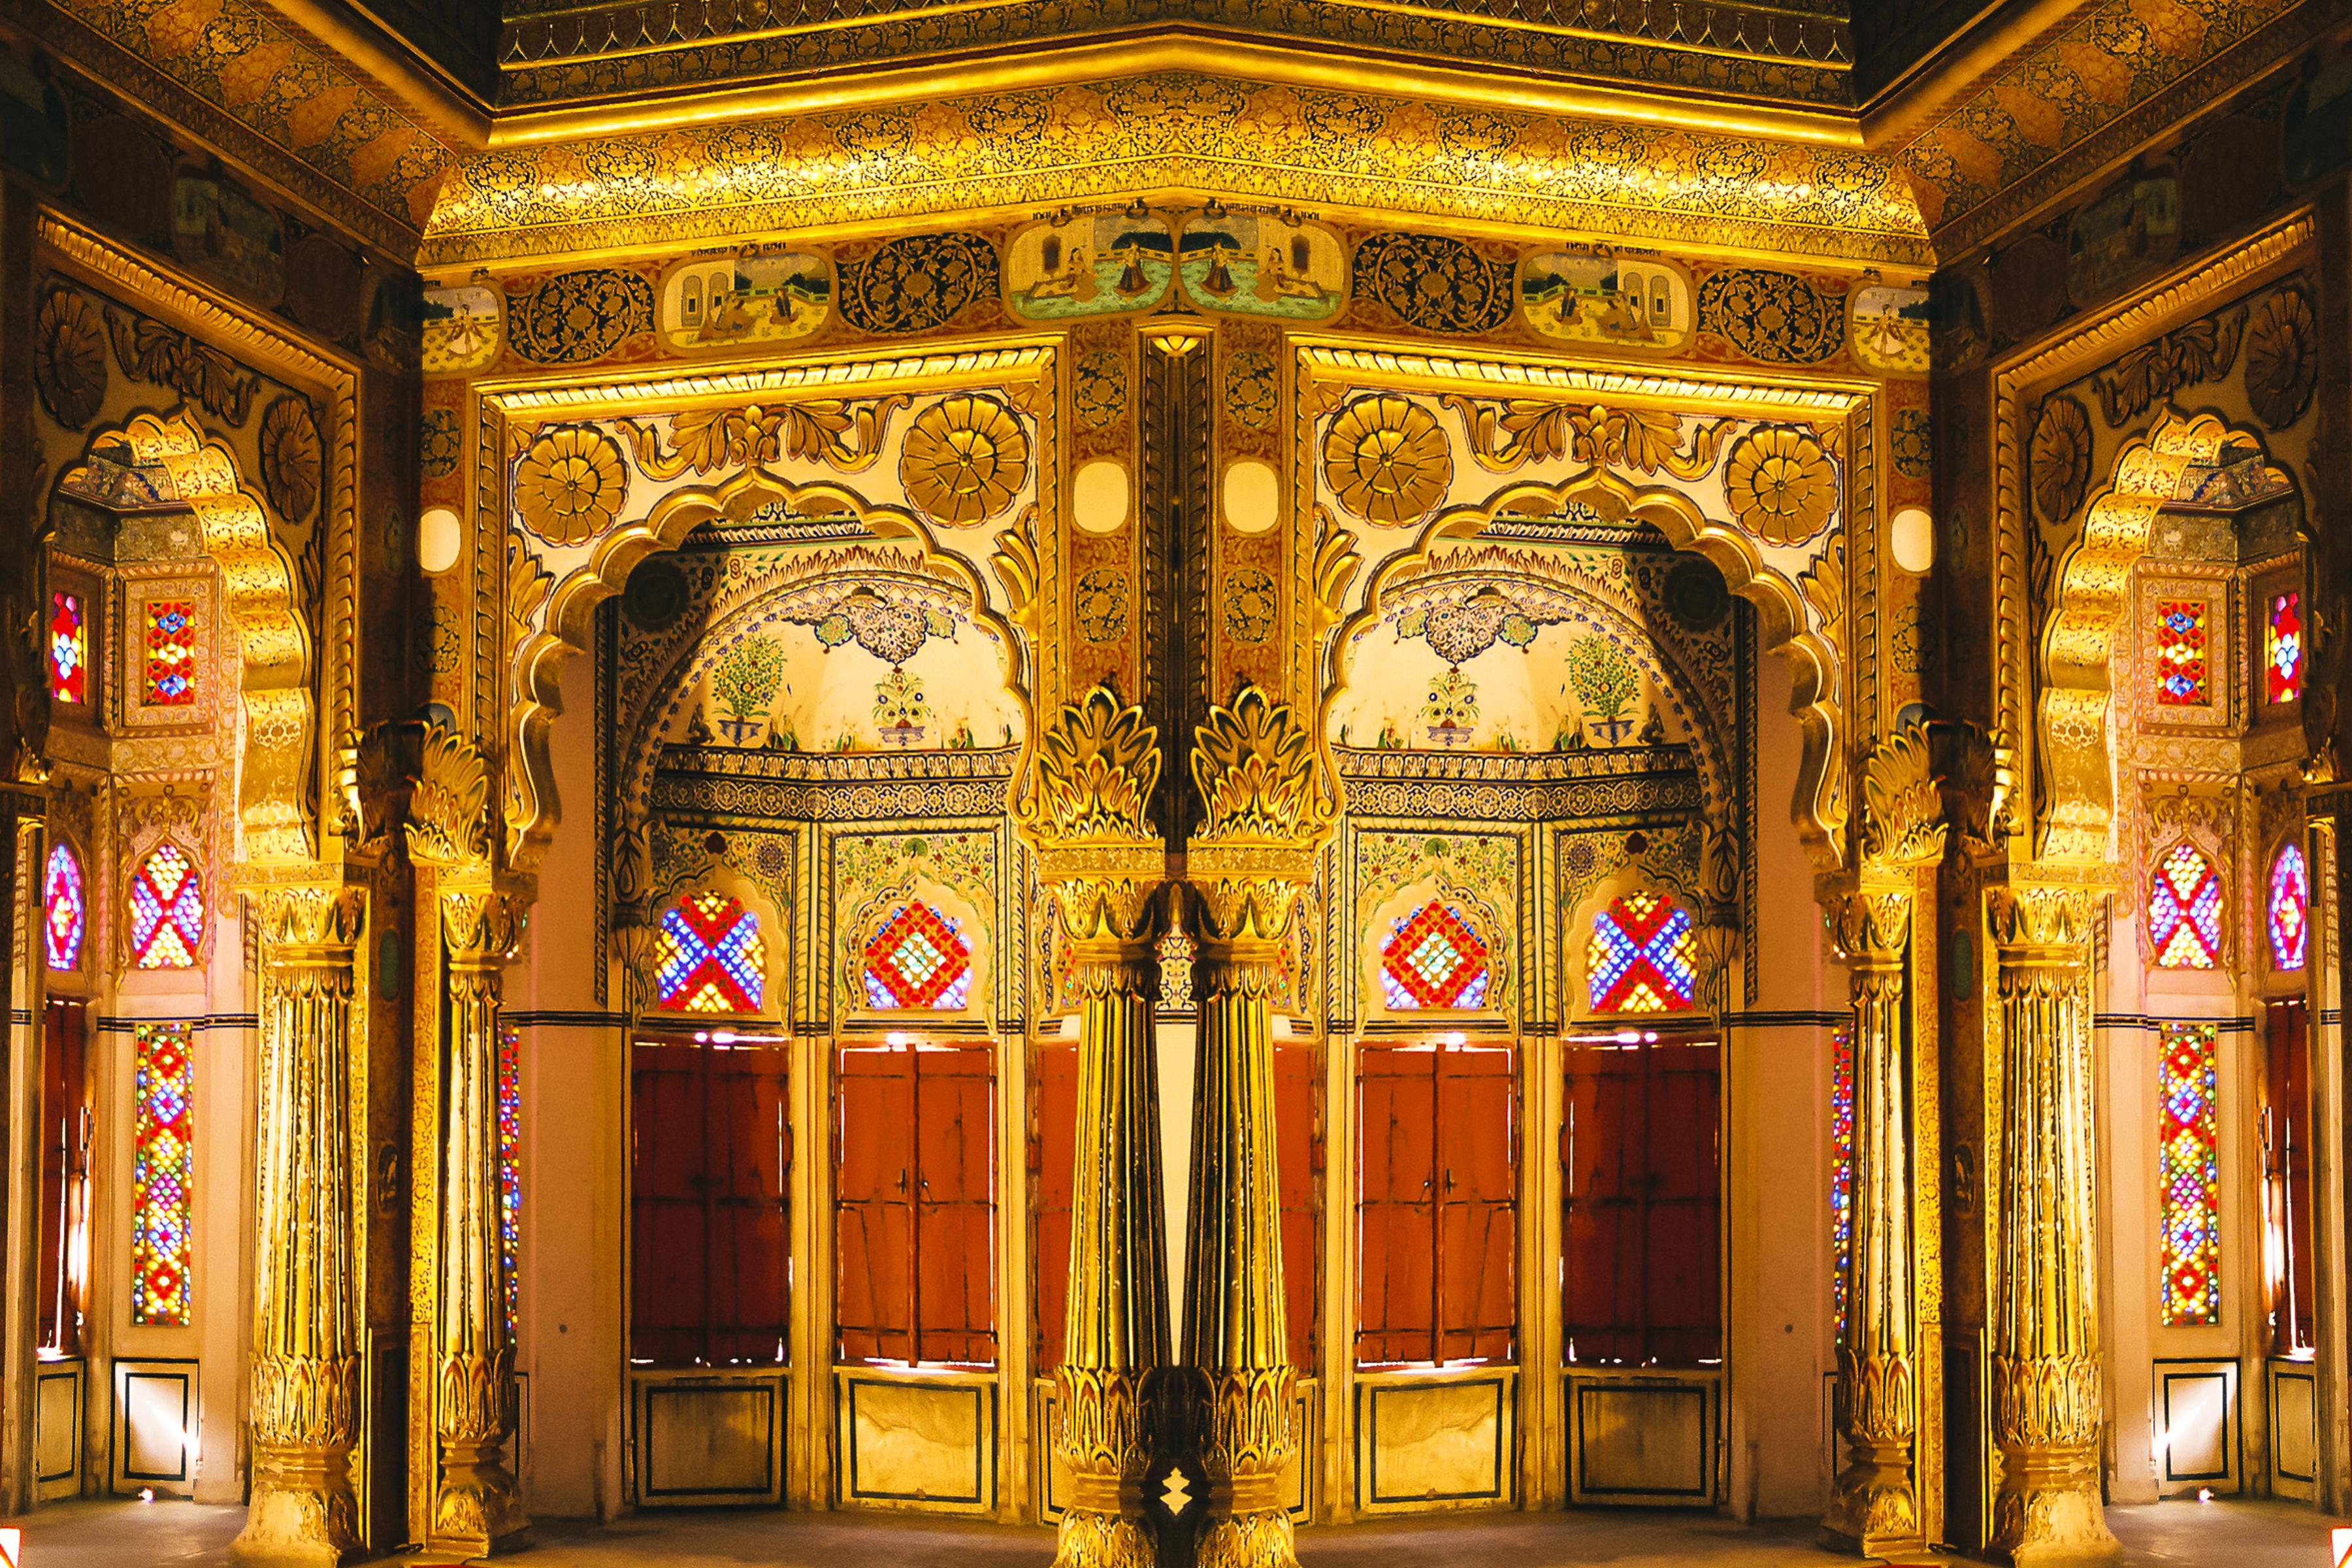 Palais_d'or